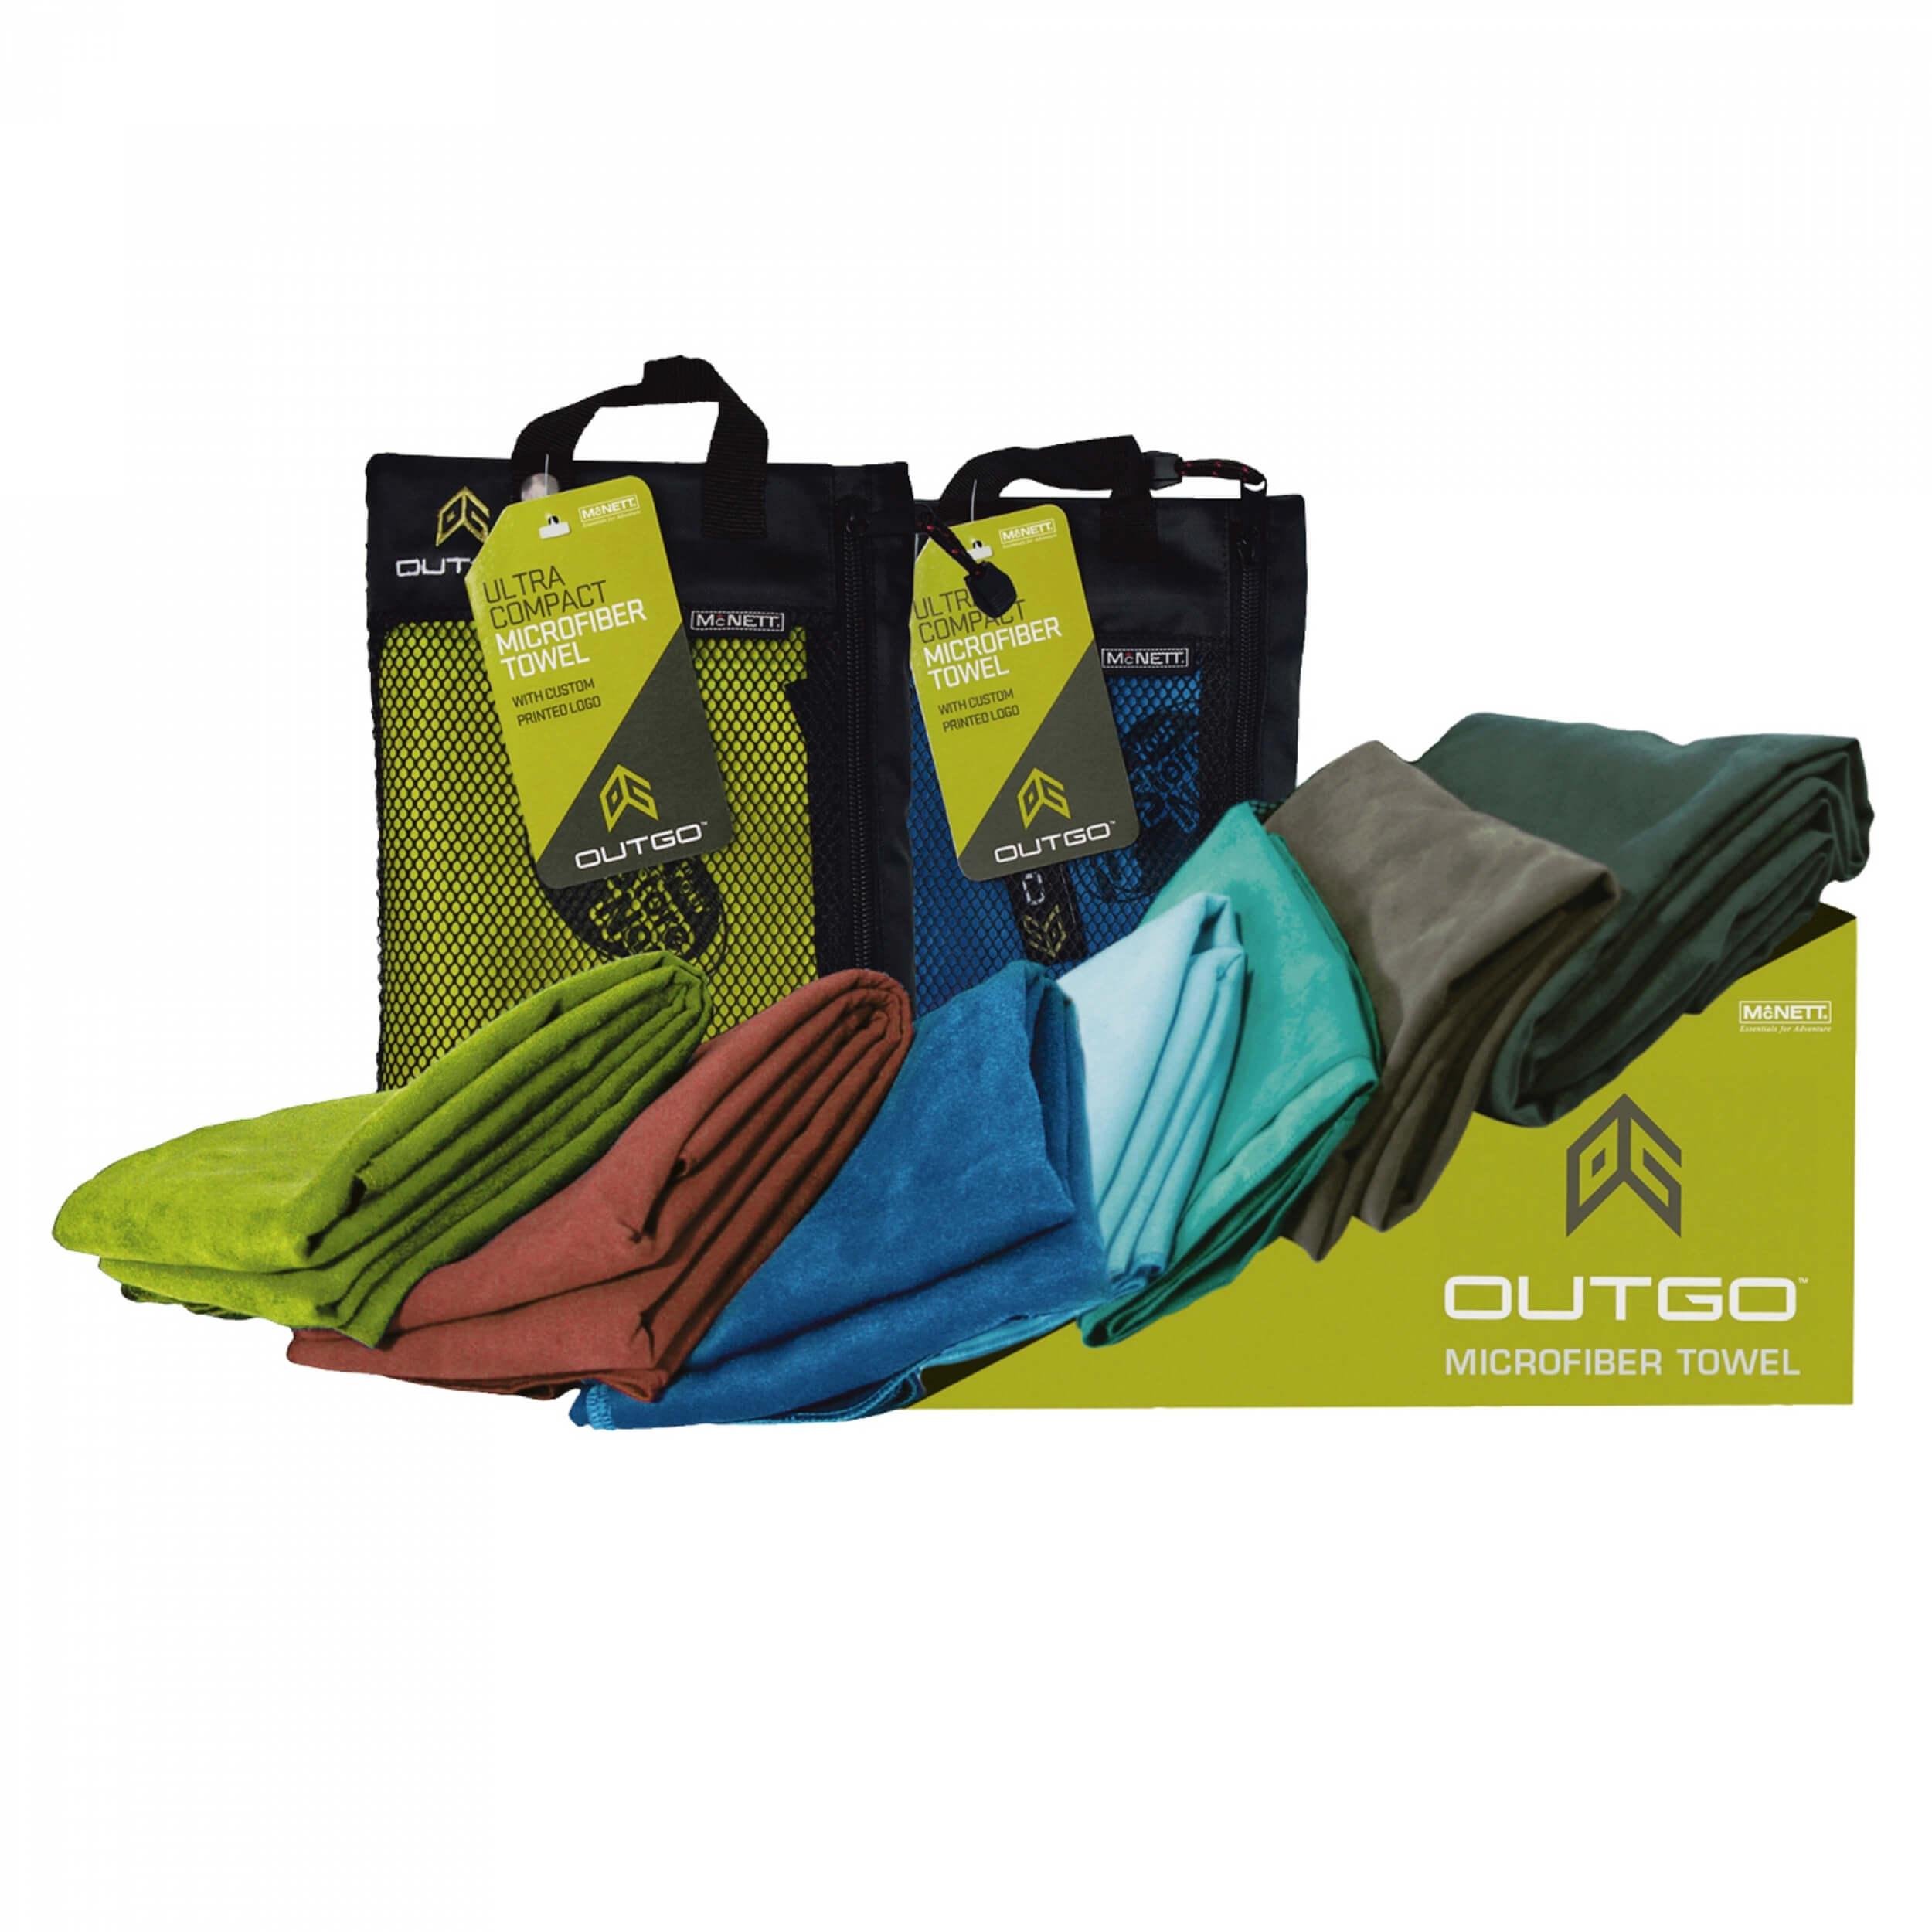 McNett Outgo Microfiber Towel kobaltblau XL